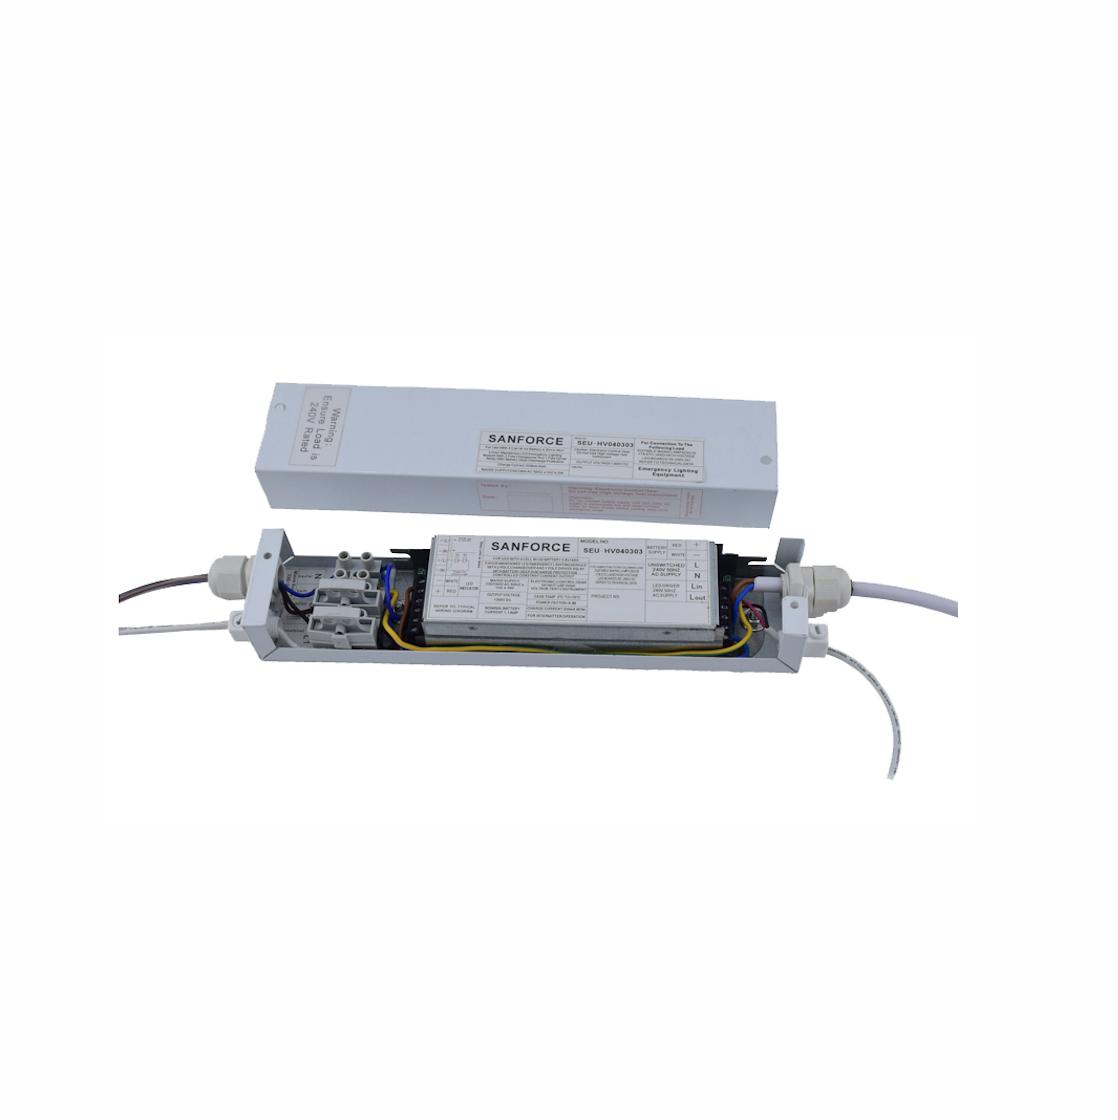 3W 6-60V DC LED Downlight Emergency Pack